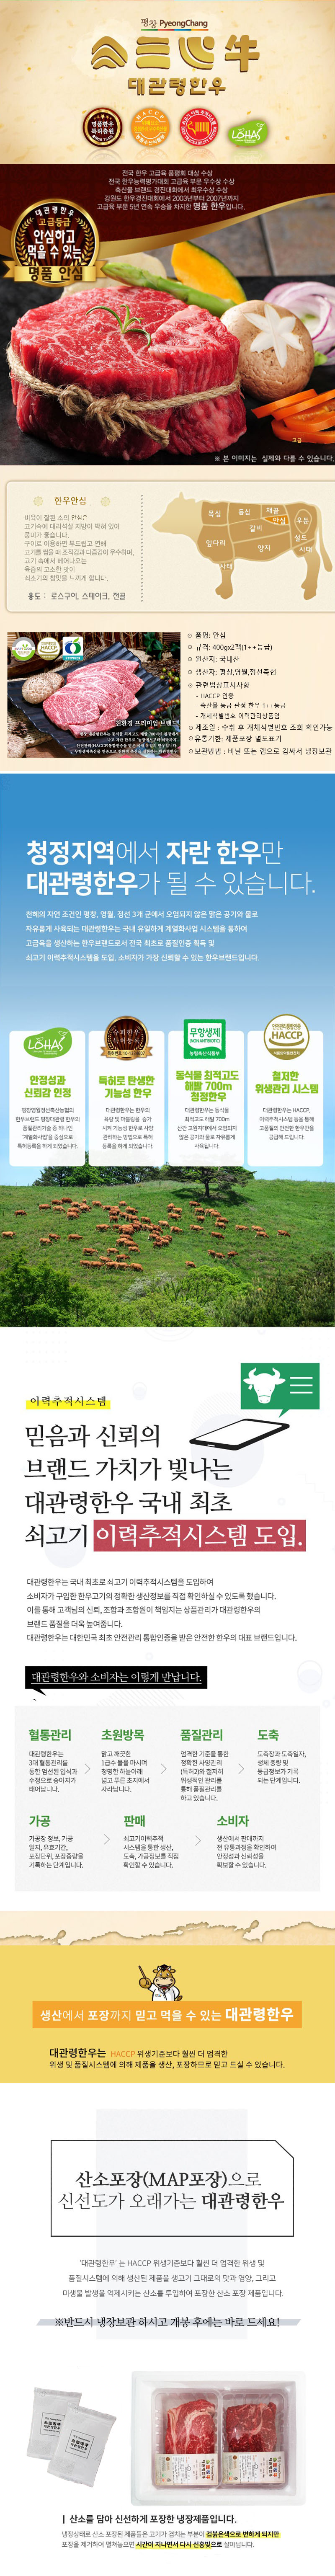 daekwoanlyenghanwoo_sang_ansim400gx2_1++.jpg